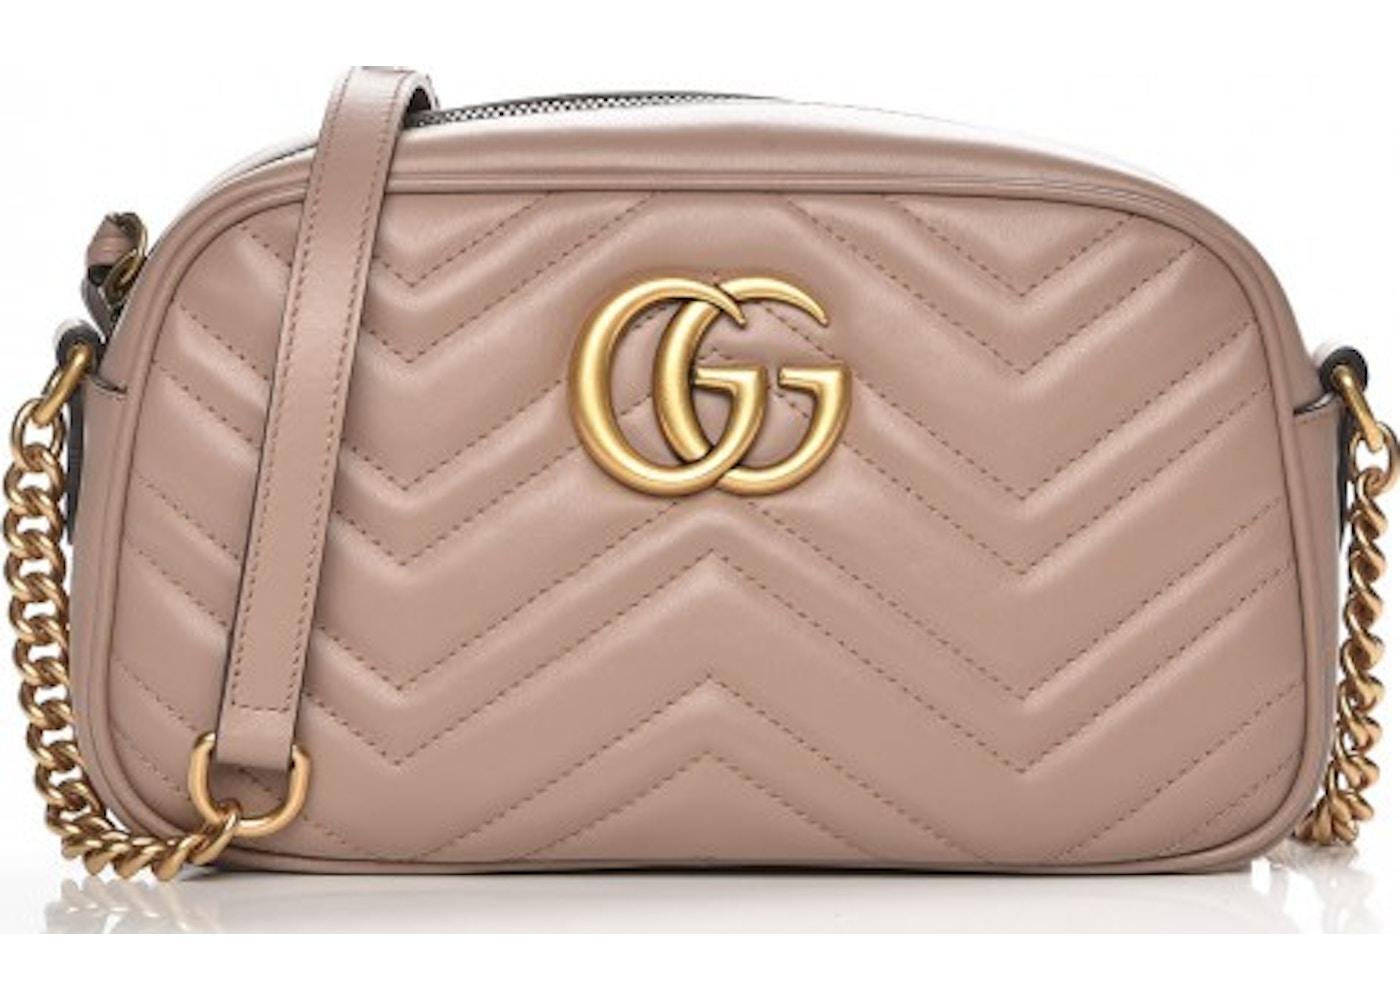 a8ad6b551 Gucci Marmont Camera Bag Matelasse GG Small Dusty Pink